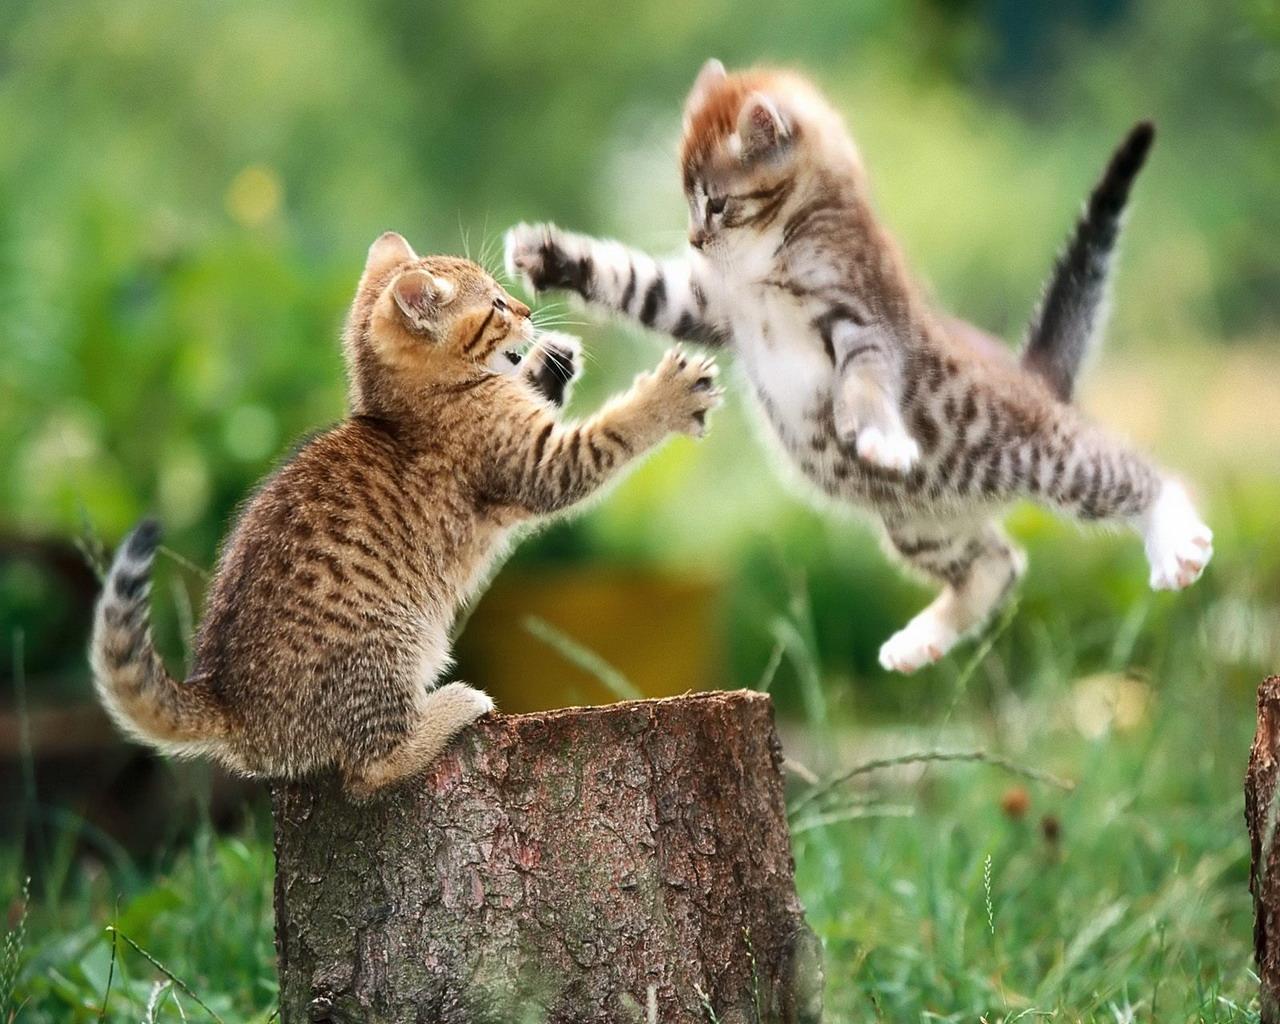 http://3.bp.blogspot.com/-C04pJu2v3G0/TclH9unZBDI/AAAAAAAAAH8/KpgnI6HcxFA/s1600/3101-cat-fight-free-wallpaperbase-com.jpg